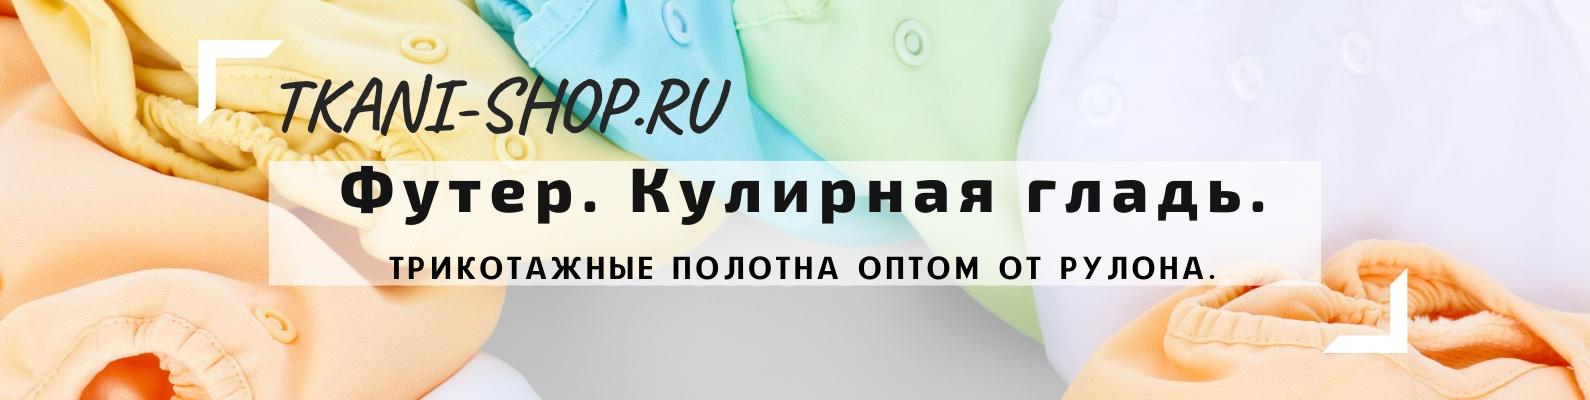 Tkani shop ru алматы ткани купить